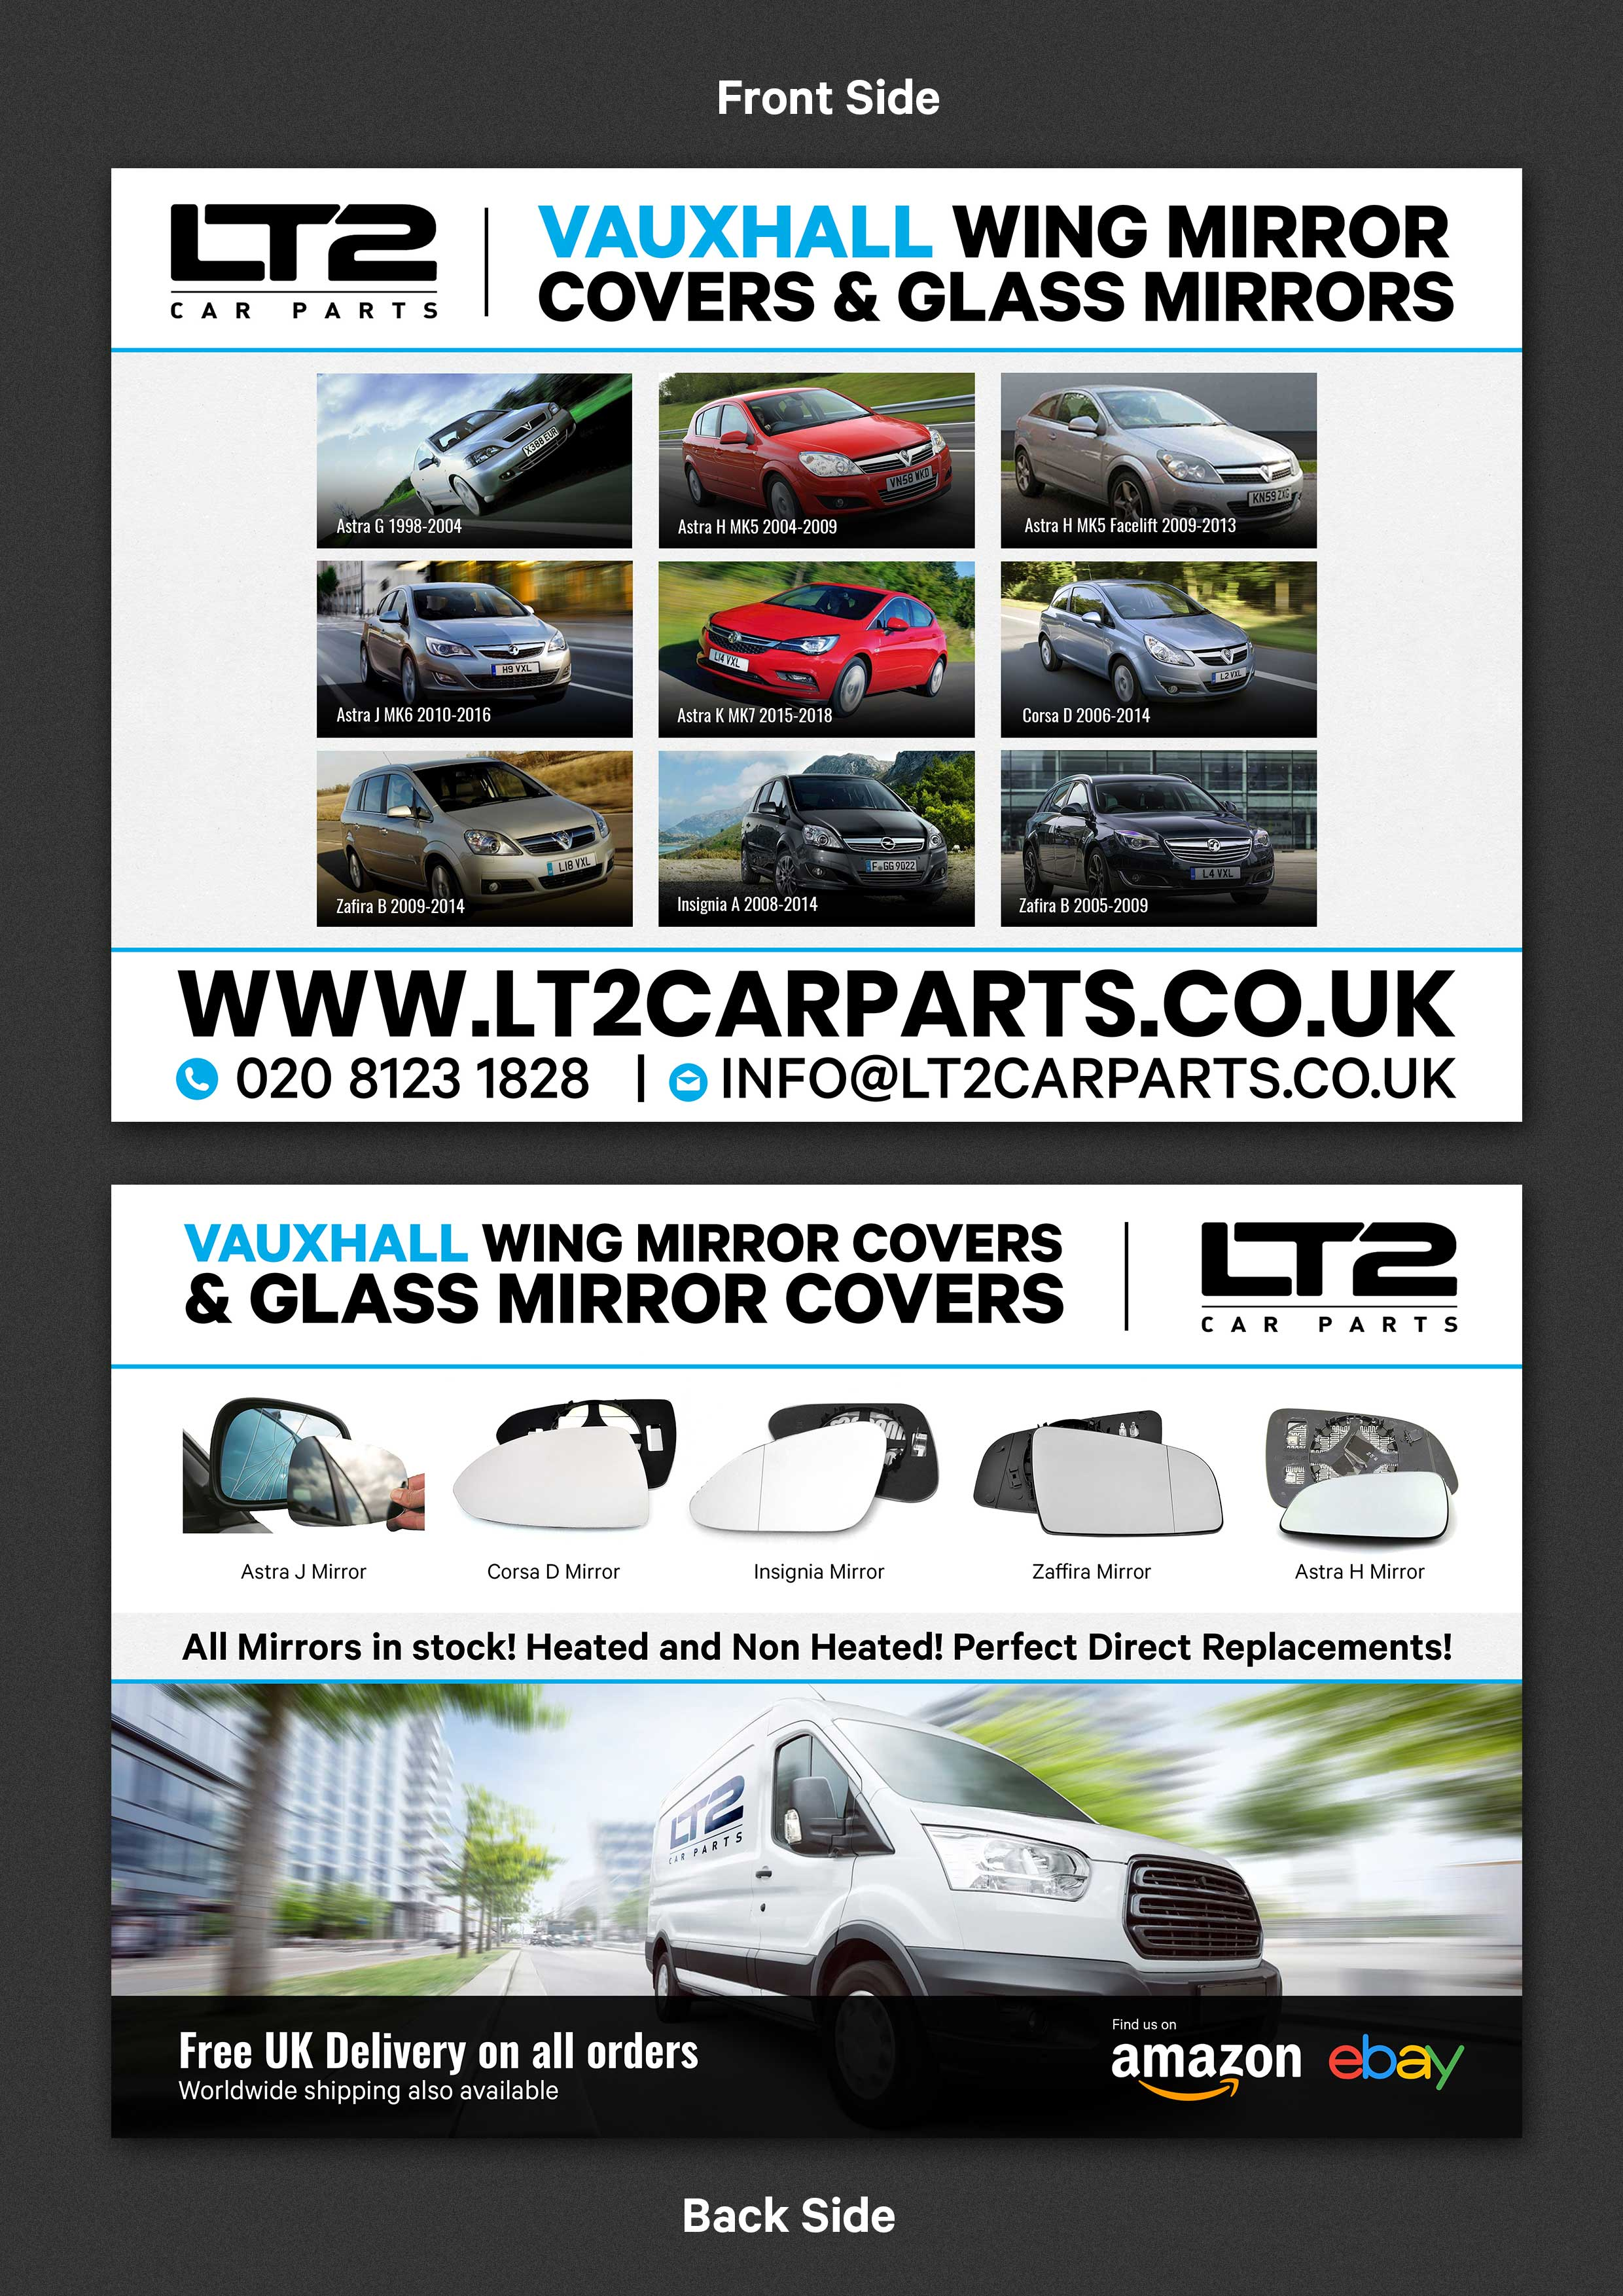 Elegant Playful Automotive Part Flyer Design For Lt2 Car Parts By Sd Webcreation Design 23109921